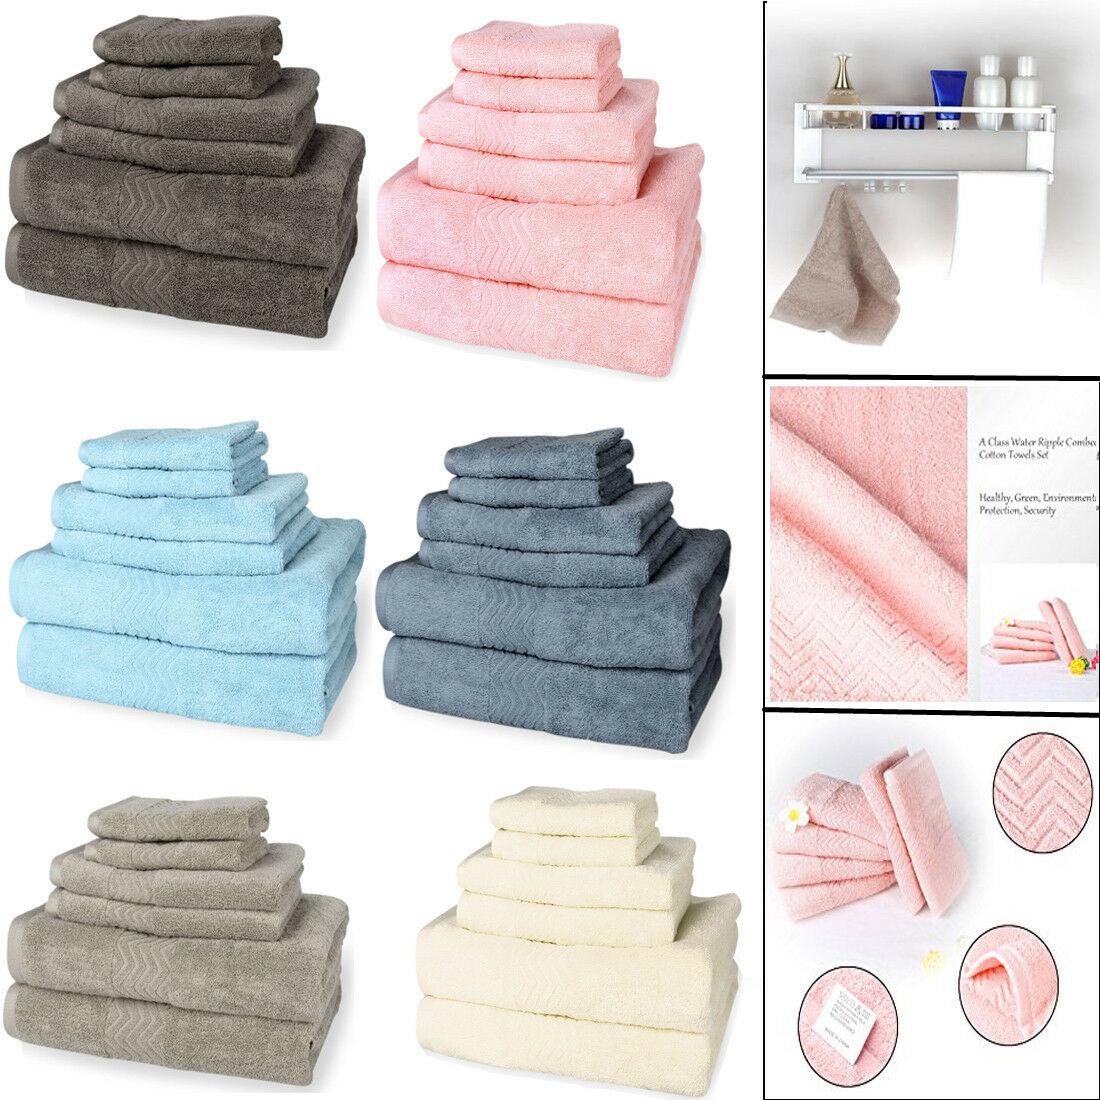 Details About Ultra Soft Absorbent Bathroom Towel Hotel Towels Set